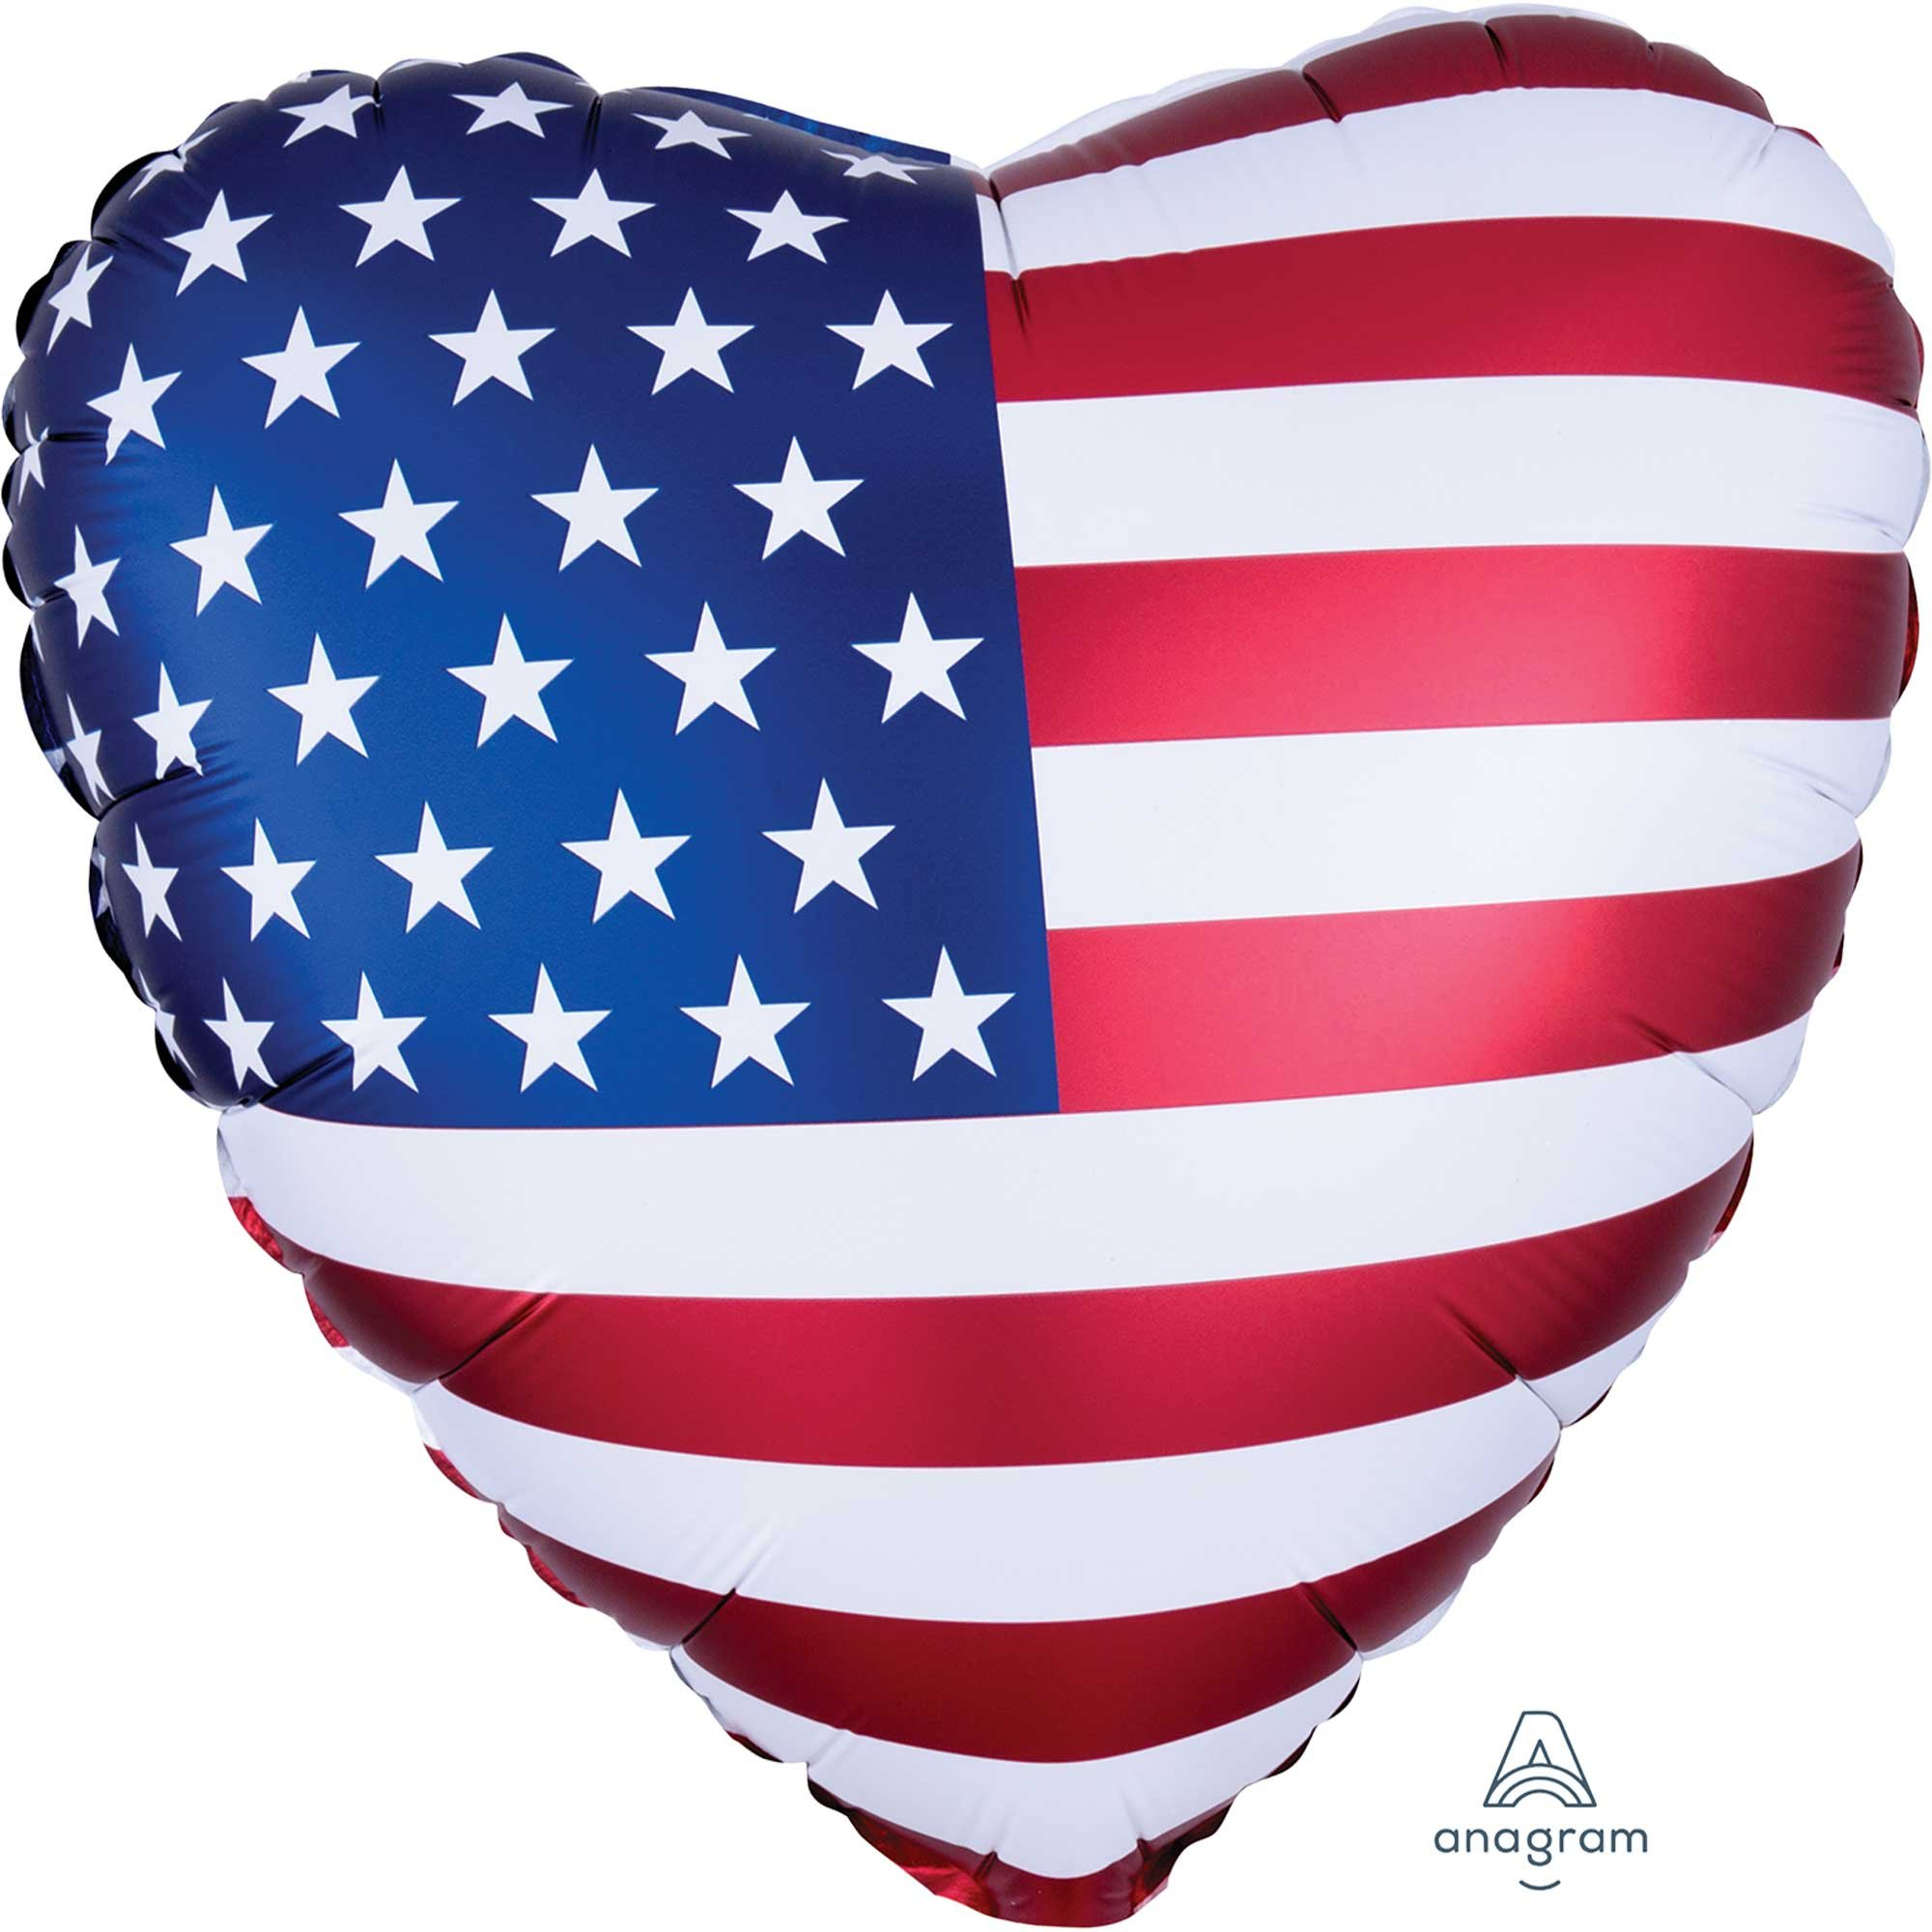 45cm Standard Satin XL Satin Infused Patriotic Heart Flag S40